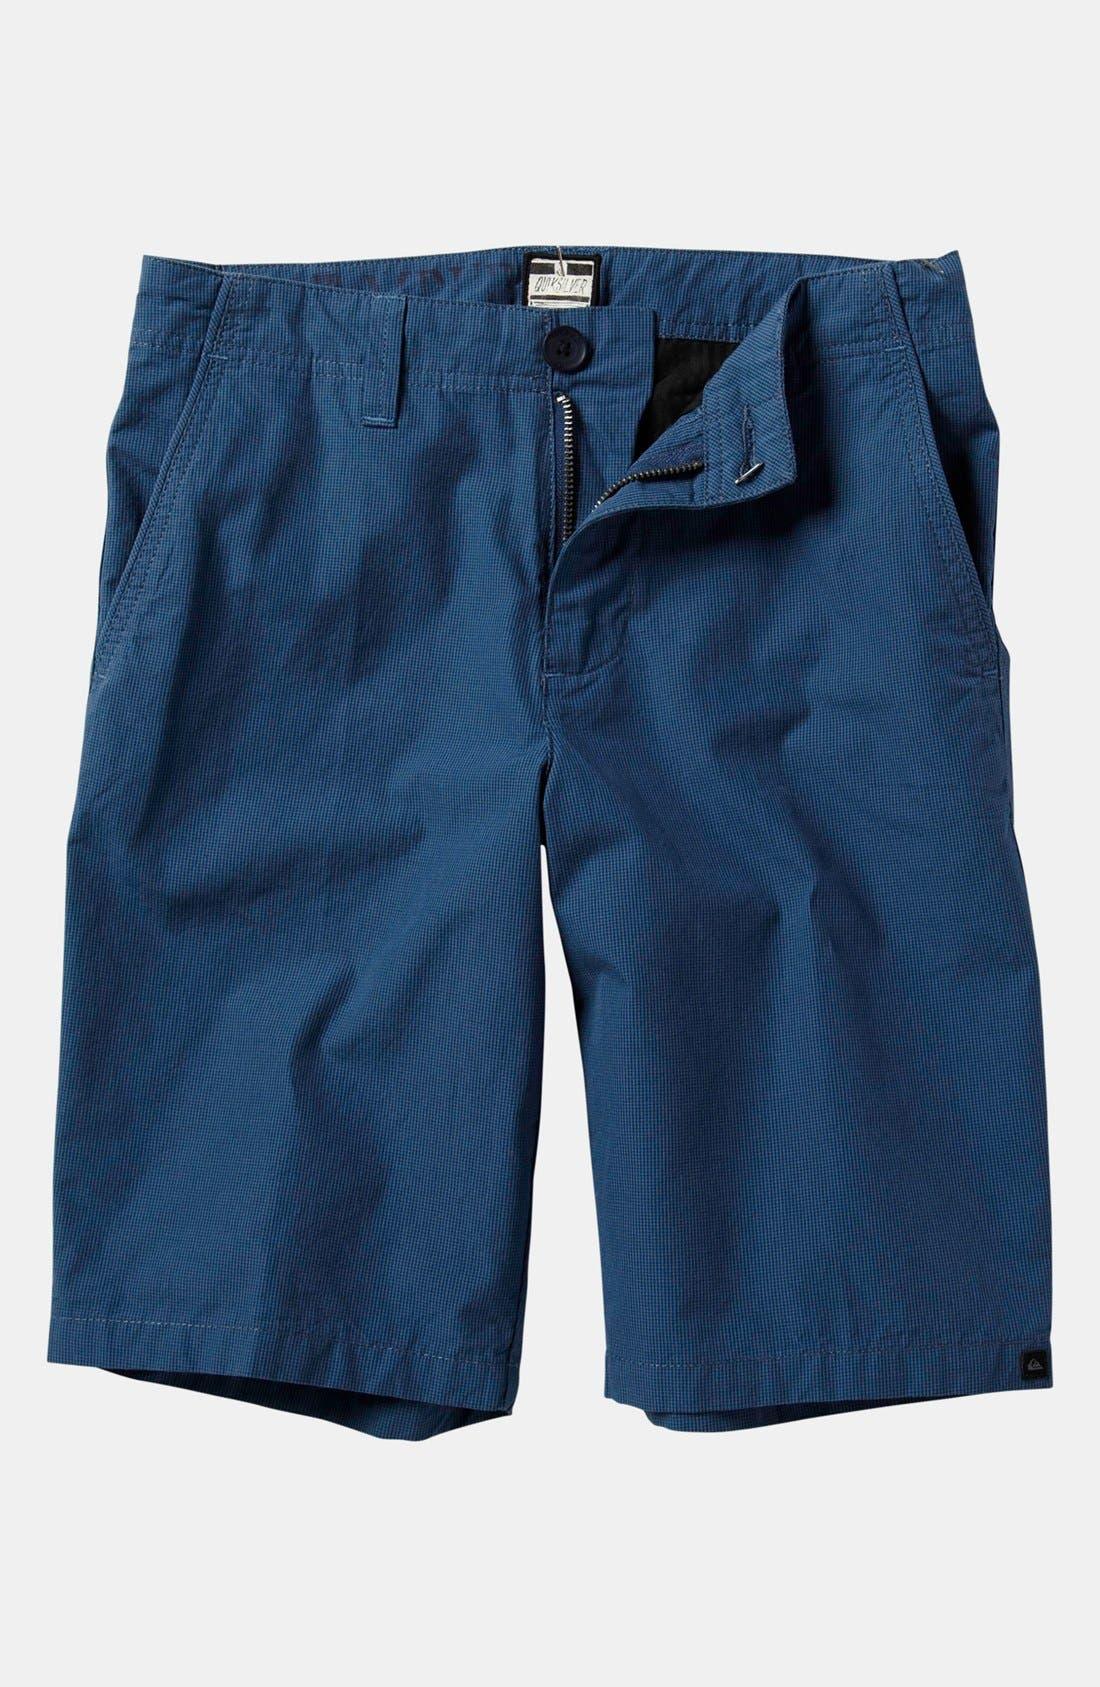 Main Image - Quiksilver 'Nugget' Shorts (Big Boys)